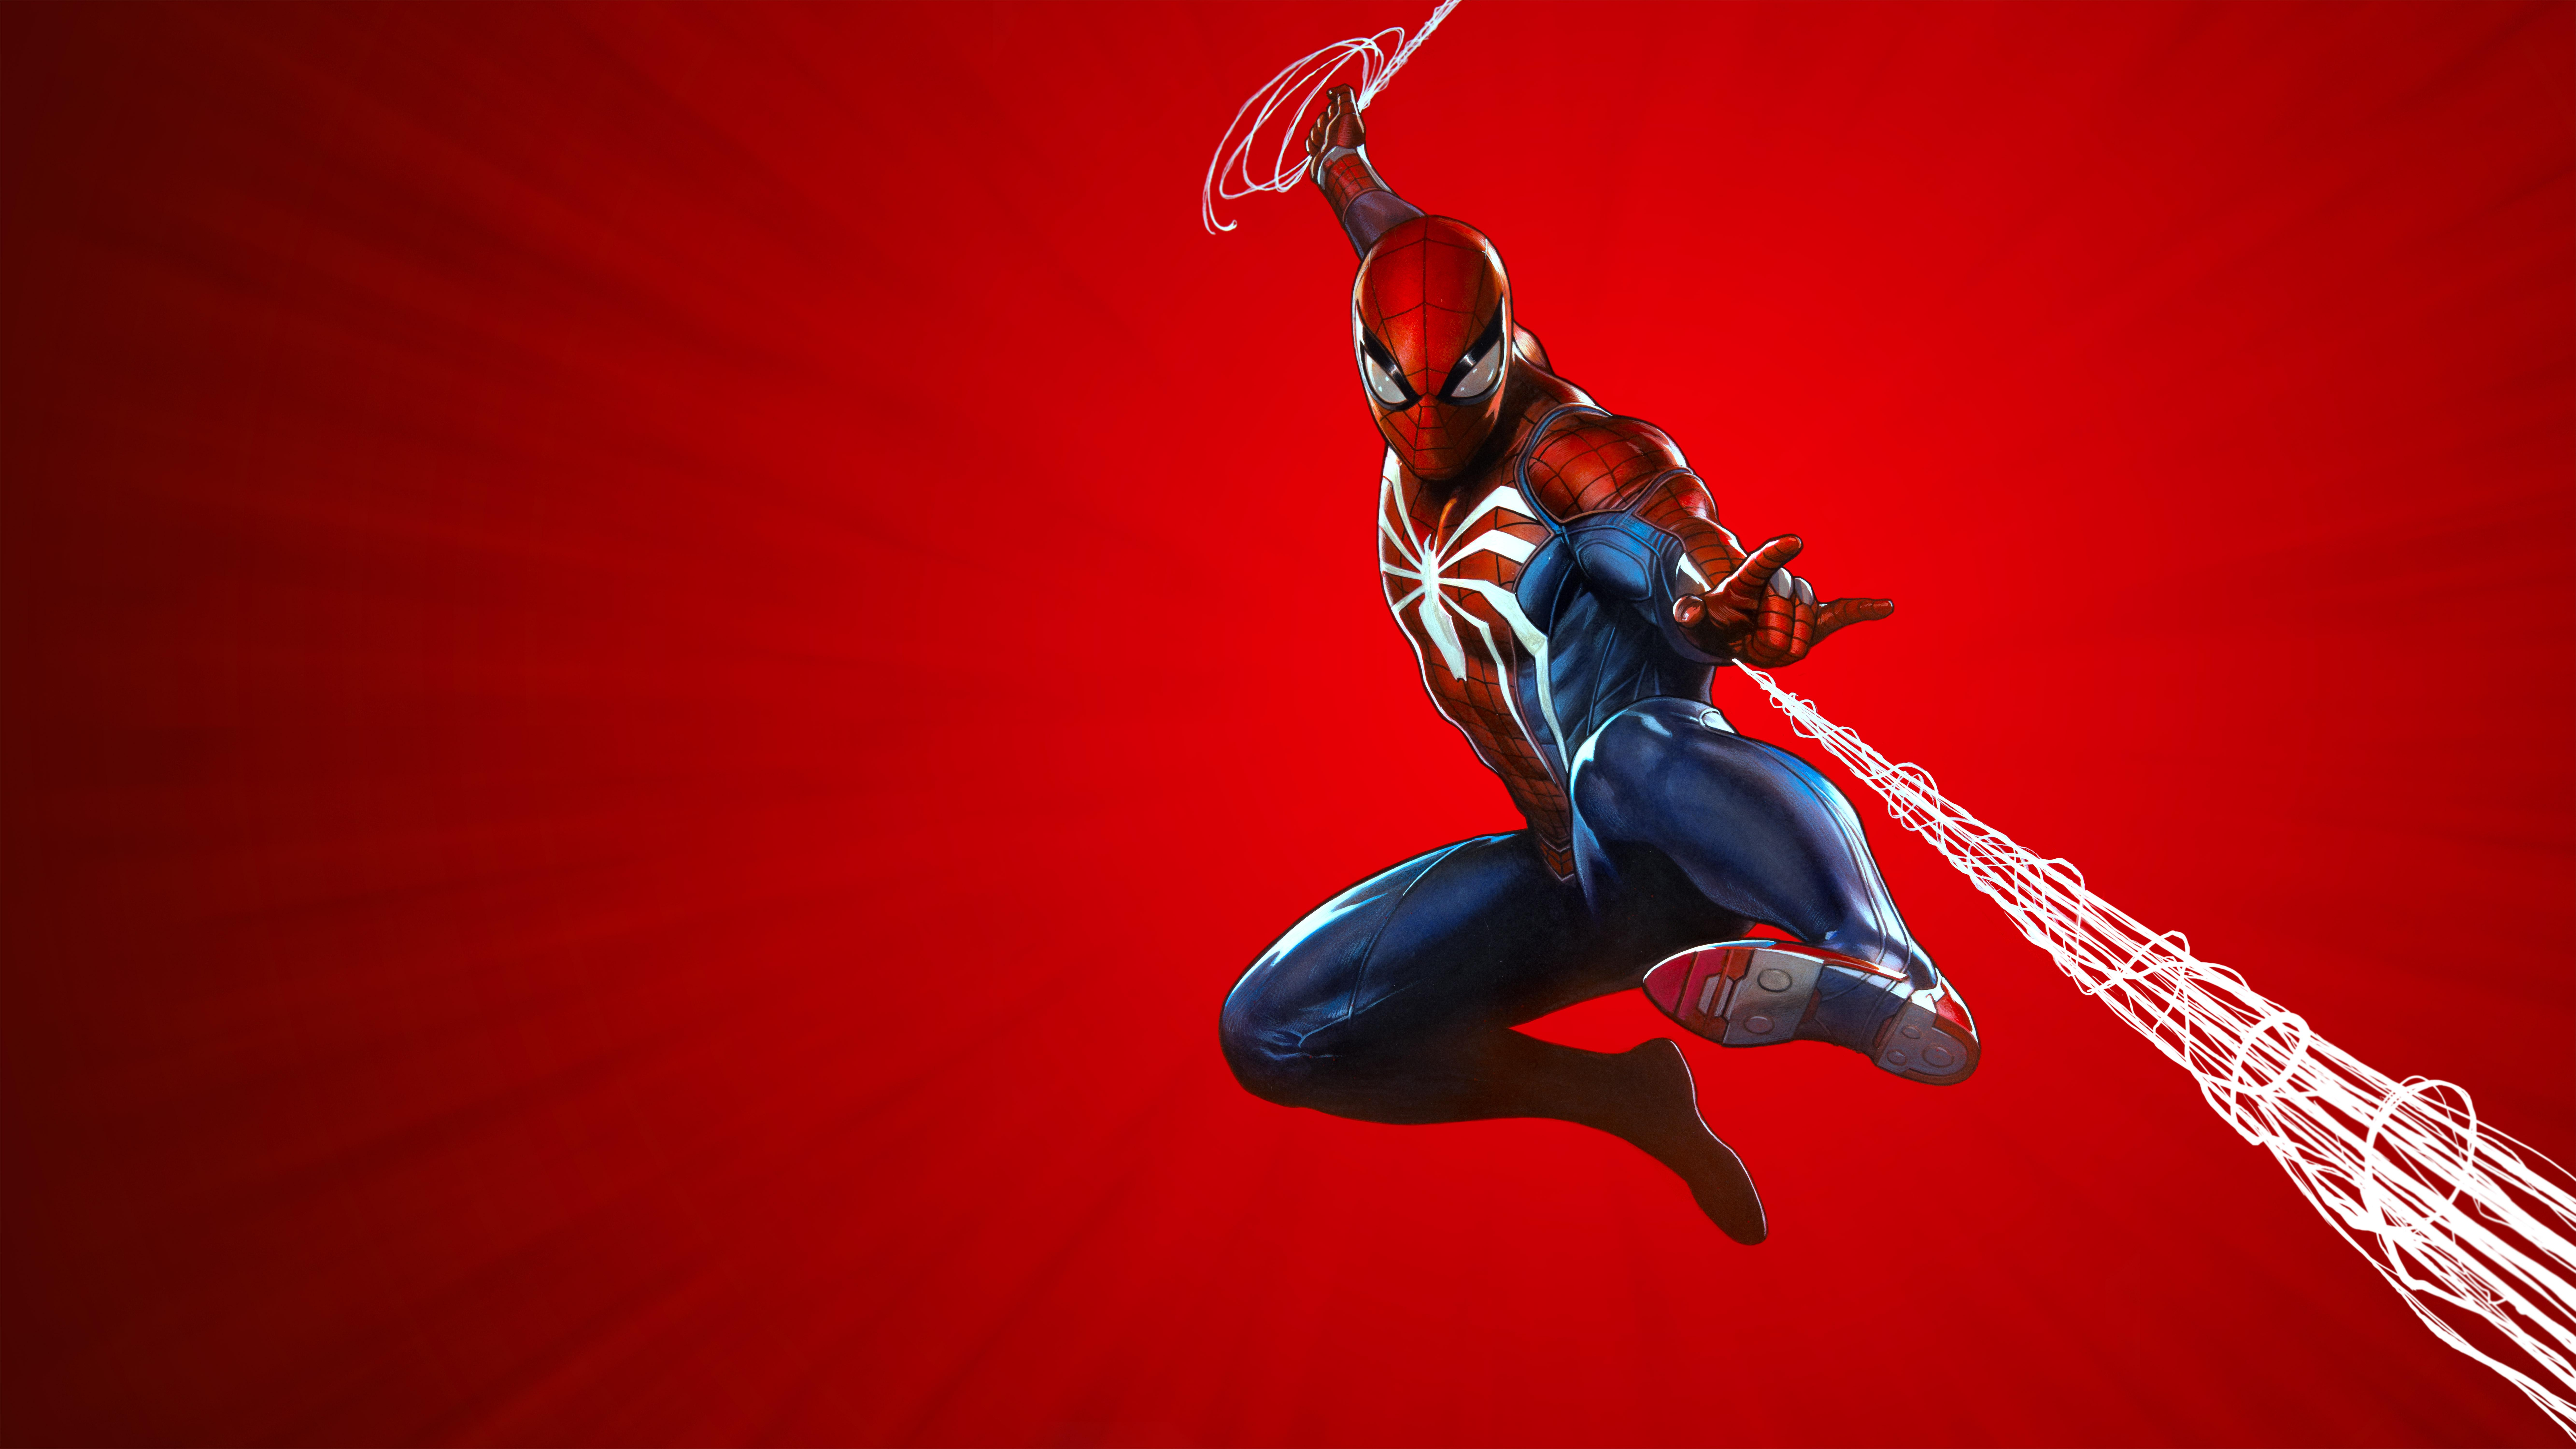 7680x4320 Marvels Spider Man Ps4 Theme Art 10k 8k Hd 4k Wallpapers